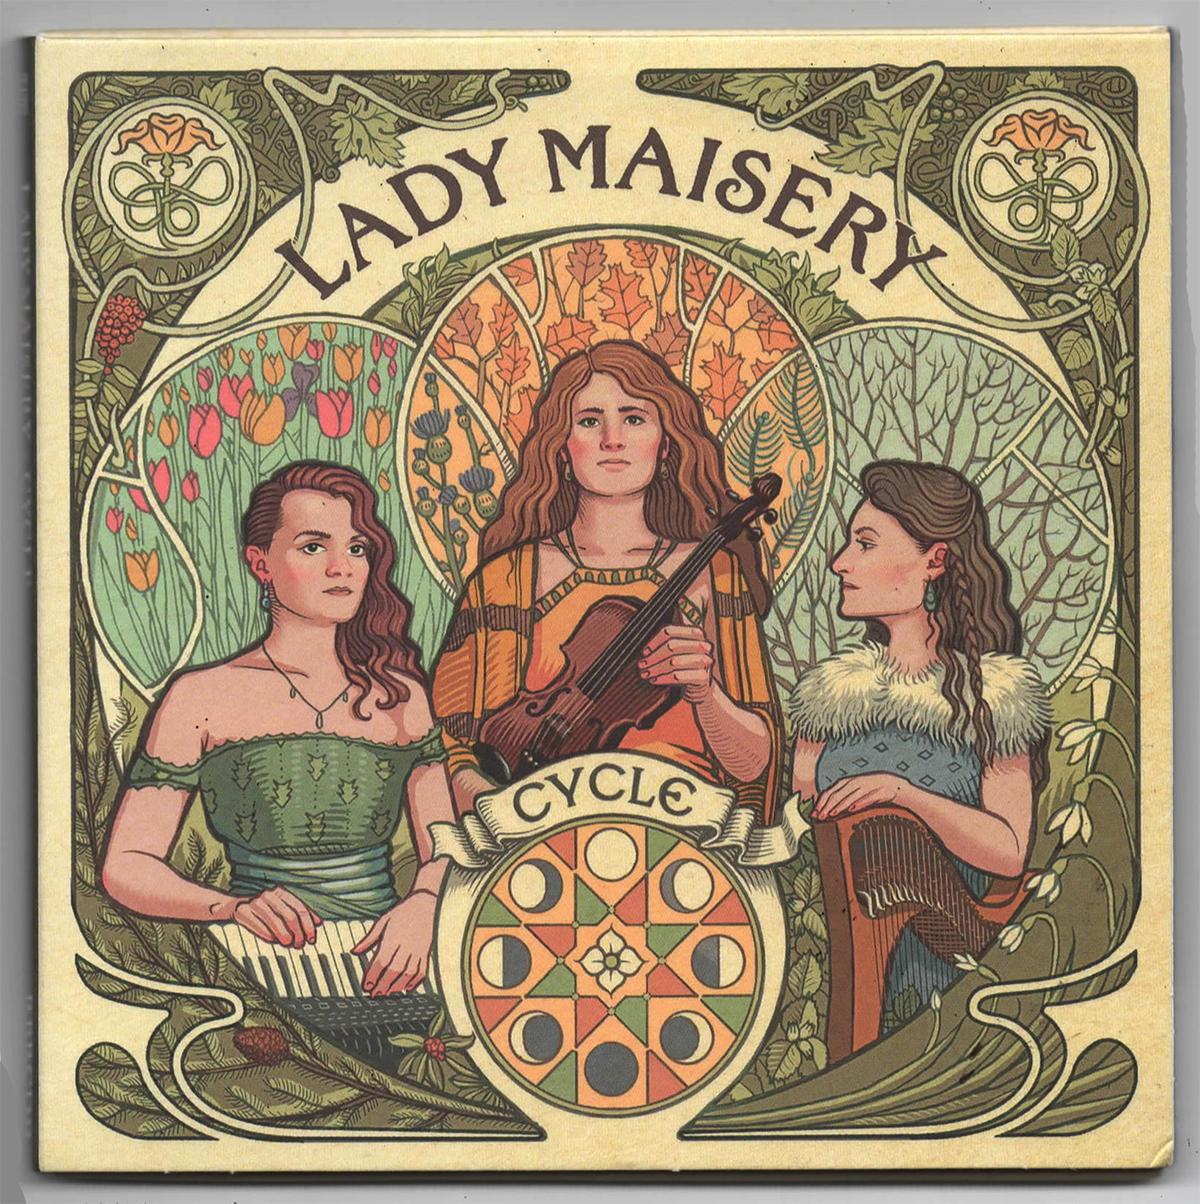 lady maisery cover web.jpg